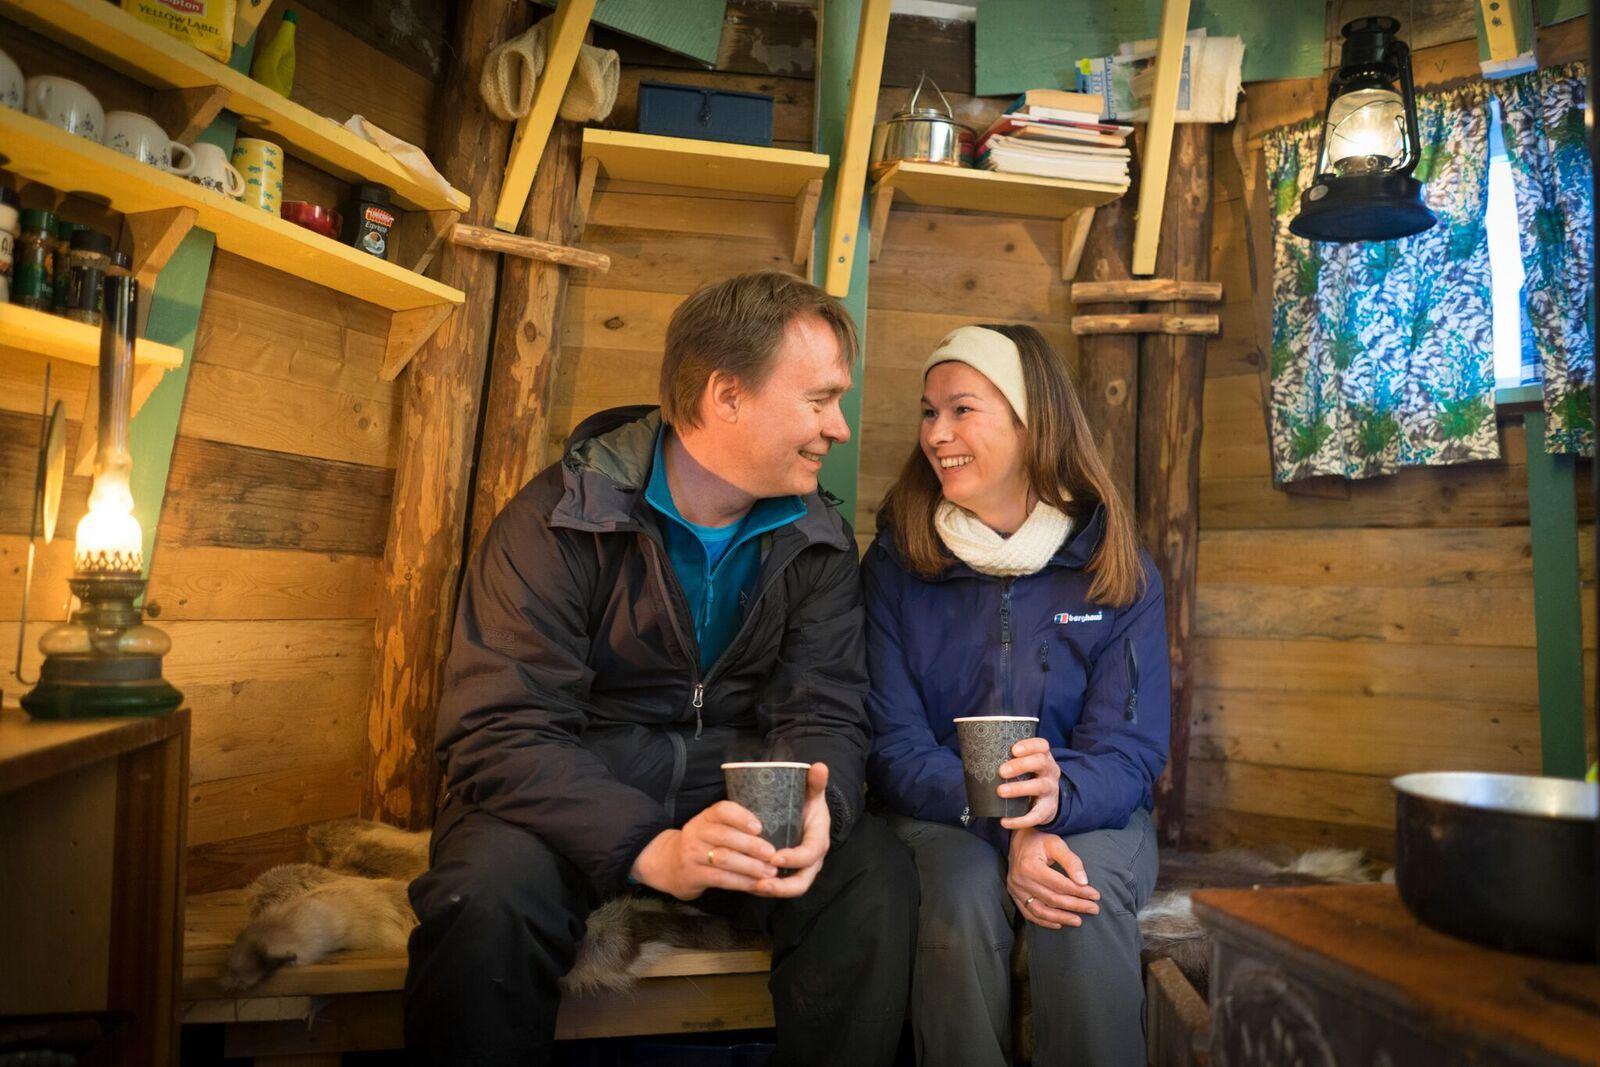 Best Kept Secret: Sami Culture, Scenery & Local Food